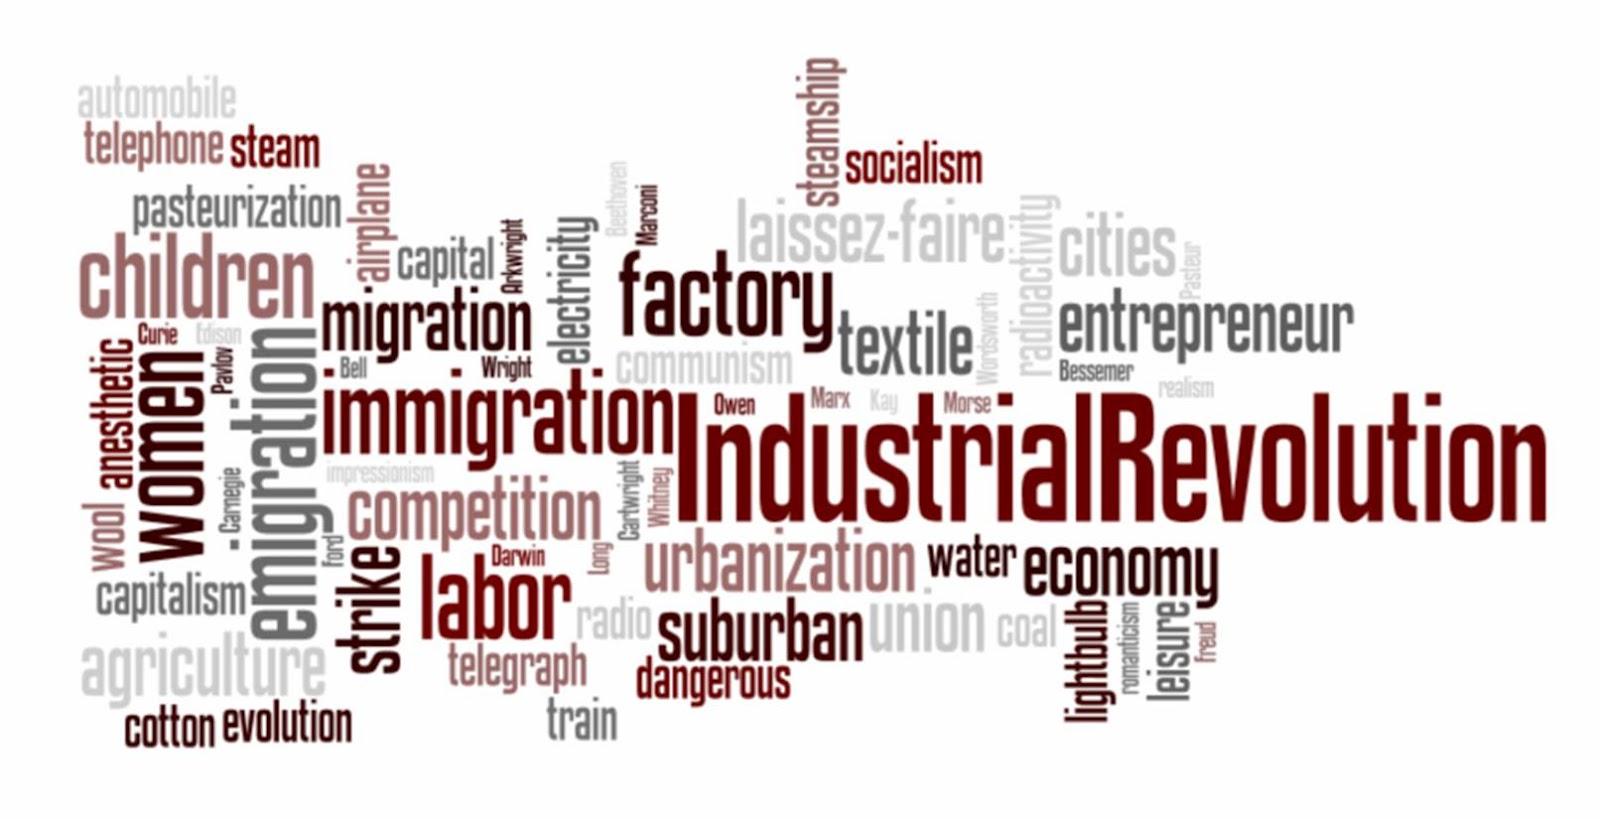 industrial revolution 2 The industrial revolution begins in england (1760-1850) why did the industrial revolution start in england the big industrial innovations: how the industrial revolution began in england.